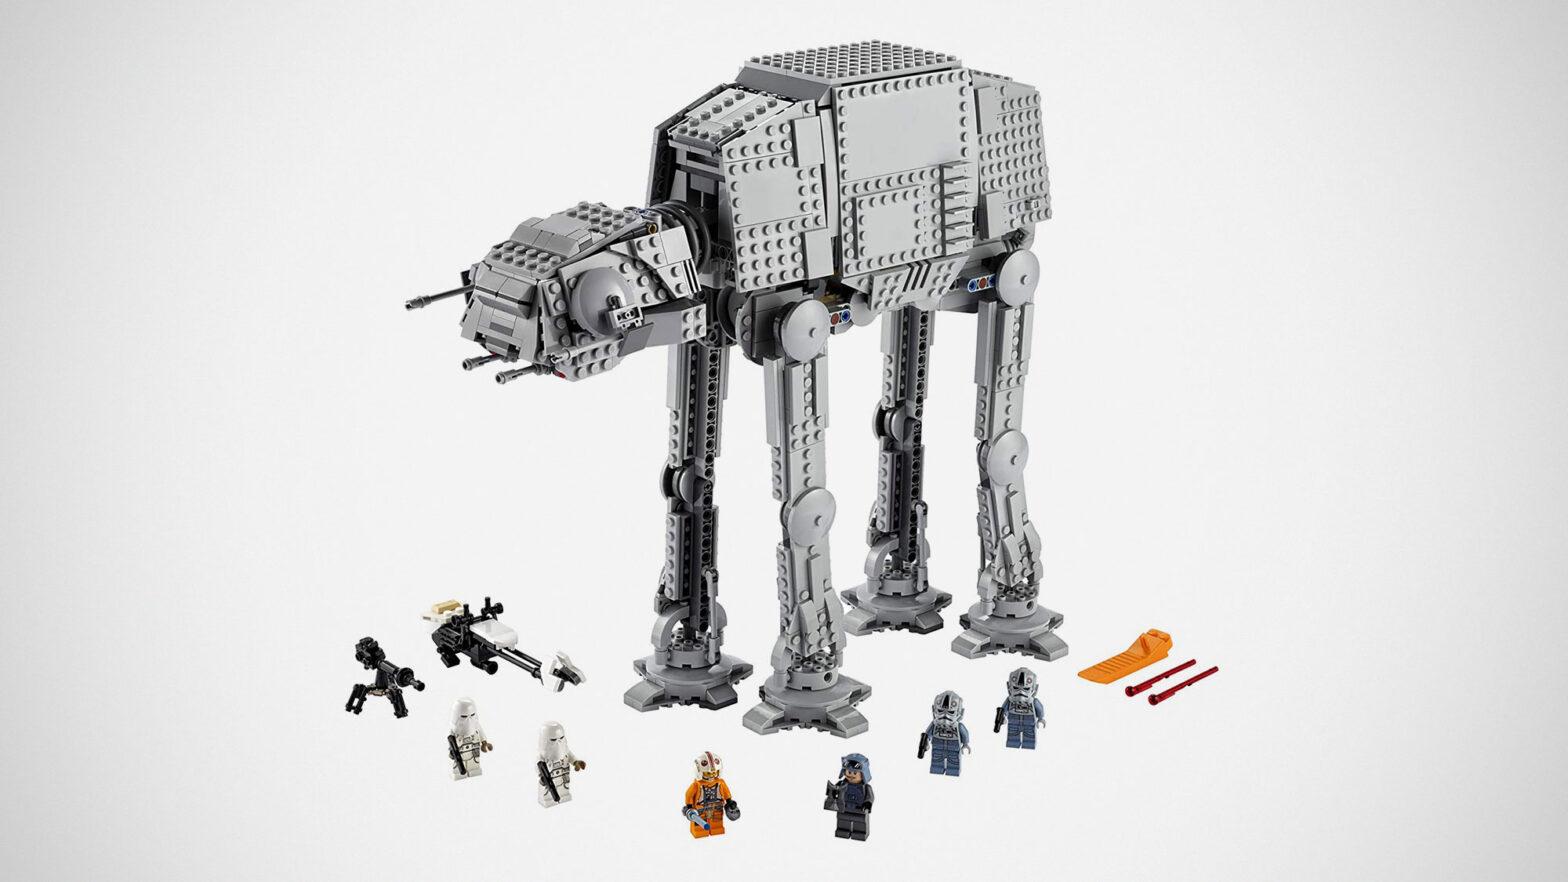 LEGO Star Wars September 2020 Amazon